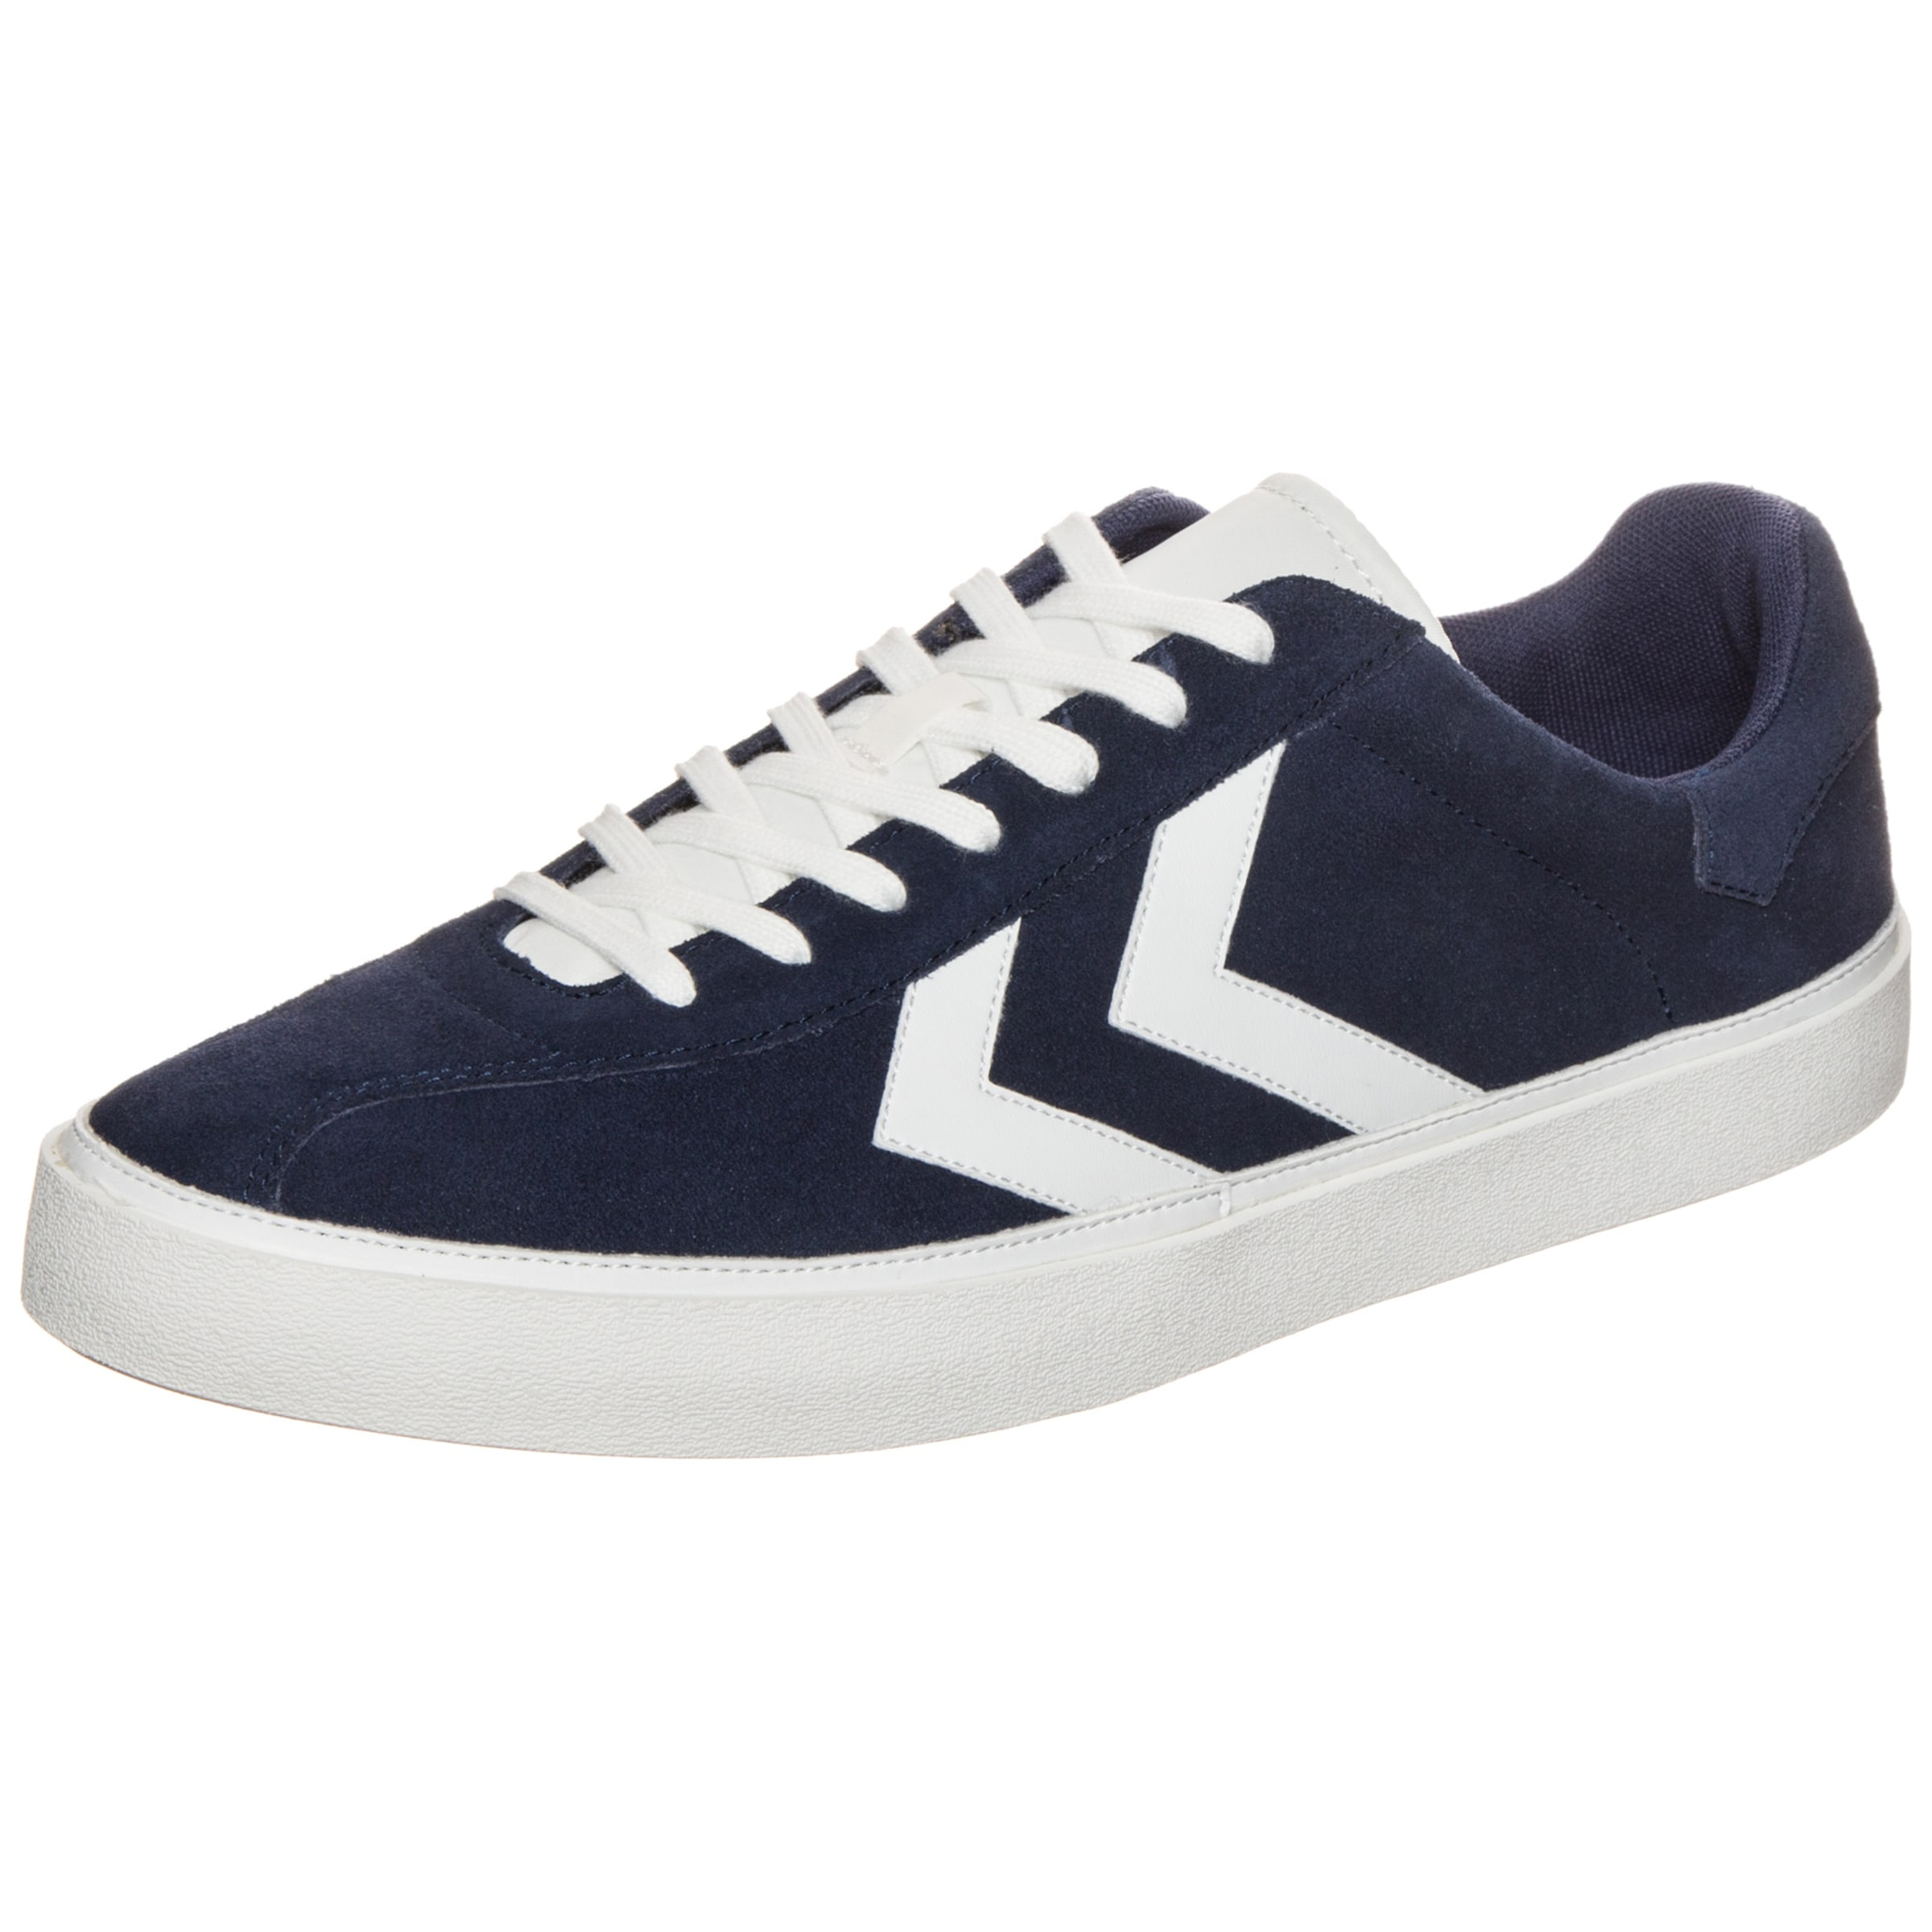 Haltbare Mode billige Schuhe Hummel | Sneaker 'Diamant Suede' Schuhe Gut getragene Schuhe